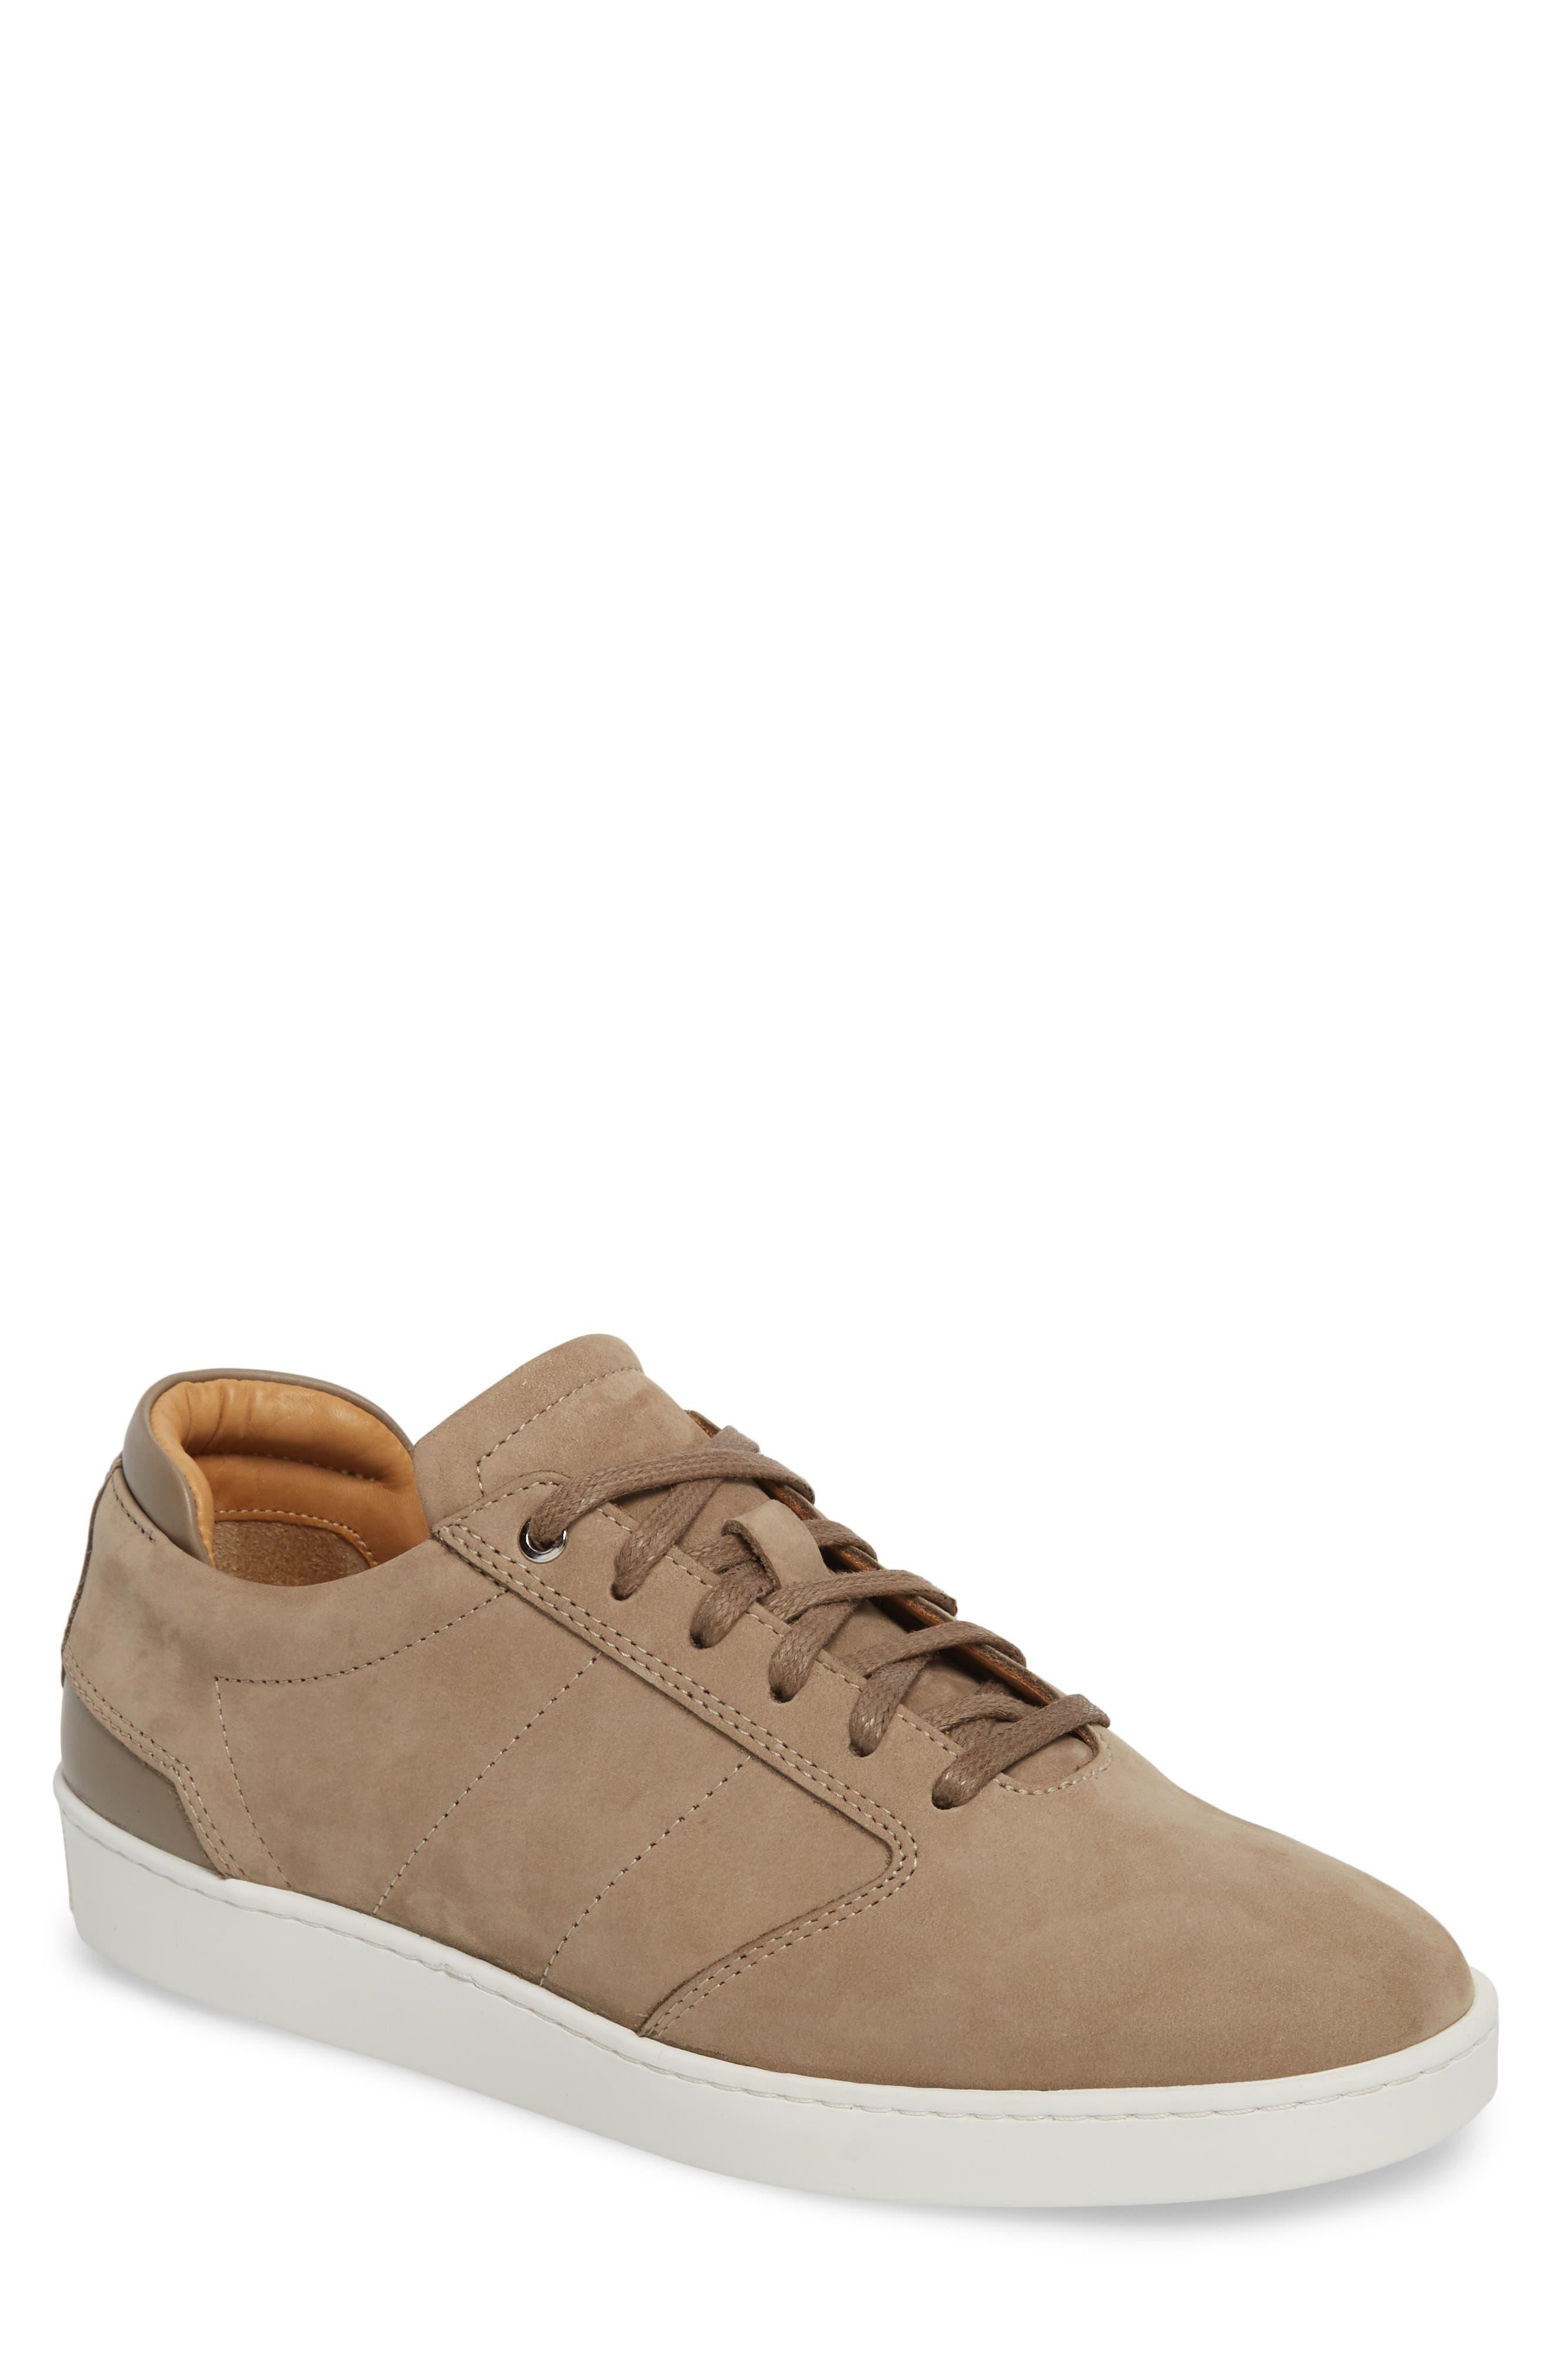 Lennon Sneaker,                             Main thumbnail 1, color,                             205